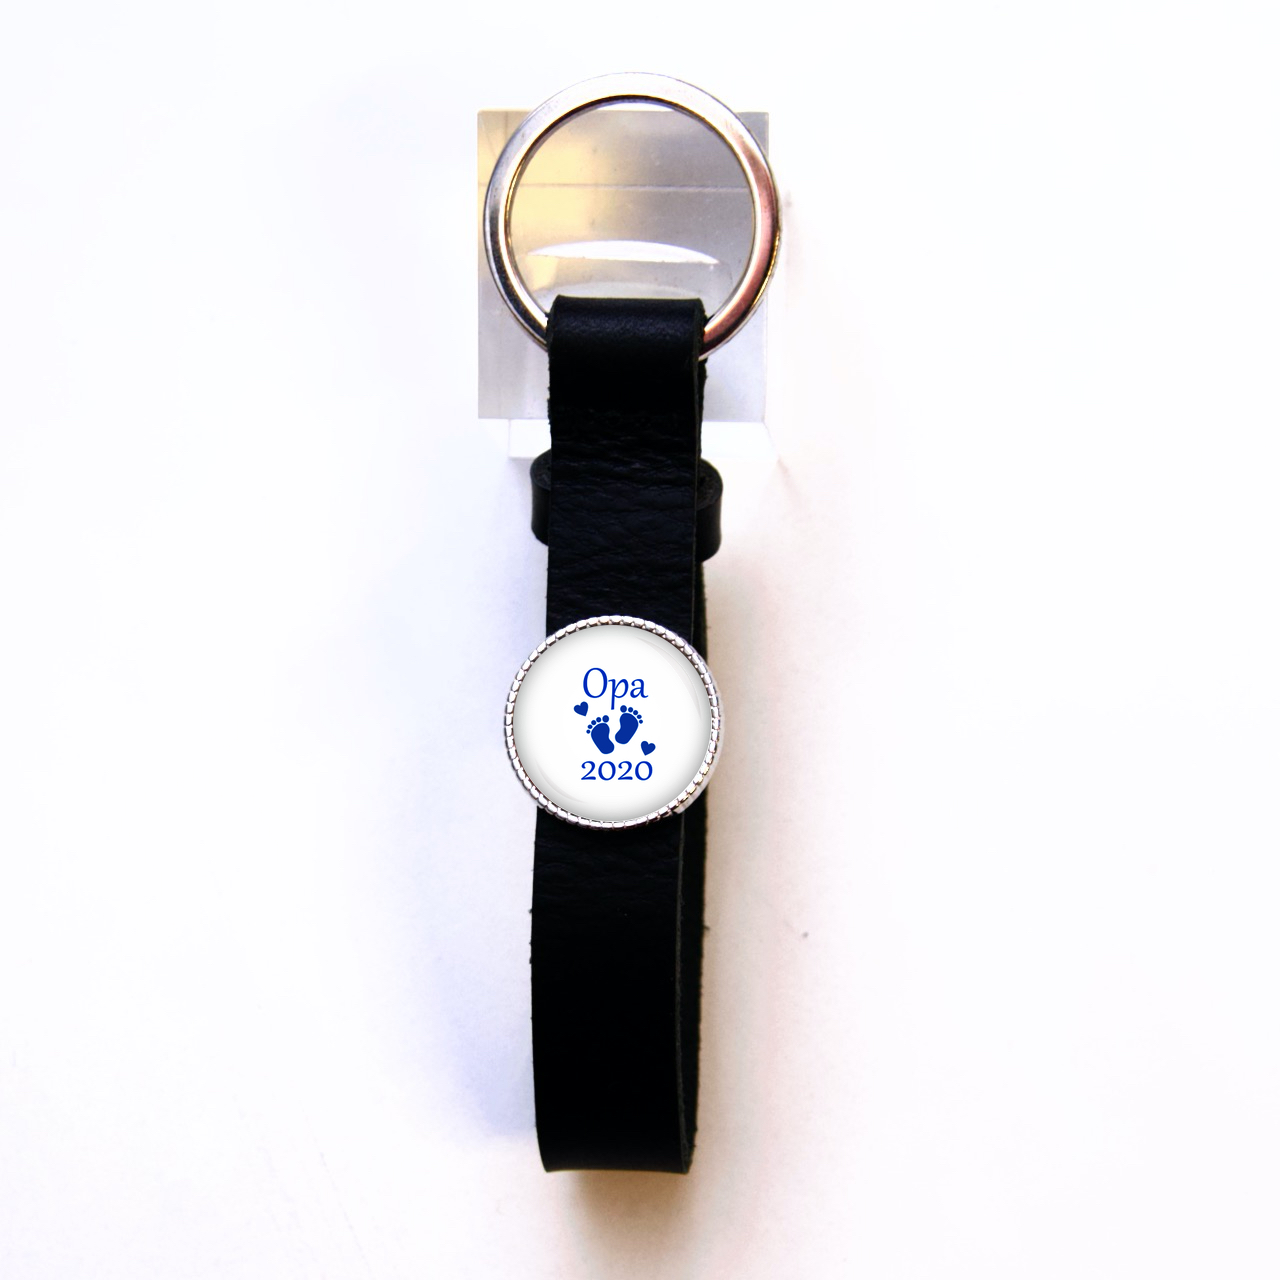 Schlüsselanhänger Leder schwarz Opa 2020